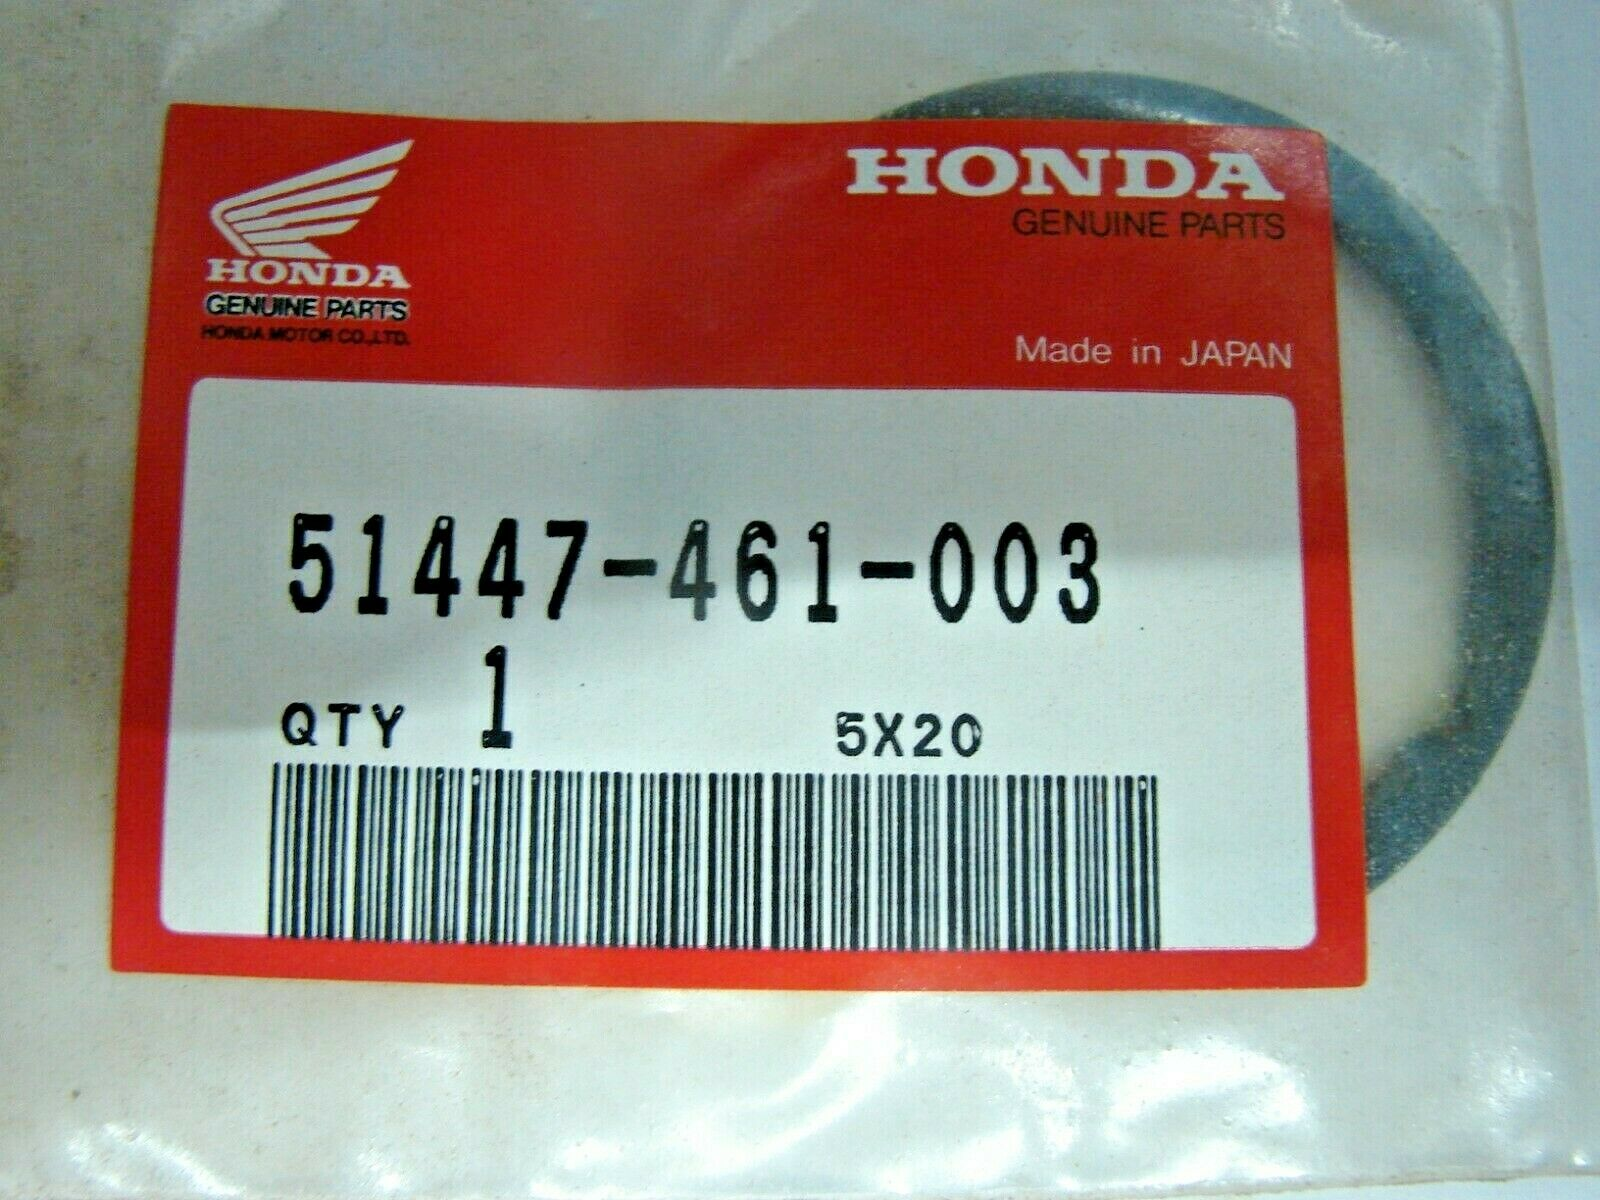 Honda CB 900 F F2 Boldor Simmerring Dichtring Staubkappen Set Gabel Repro 37 mm